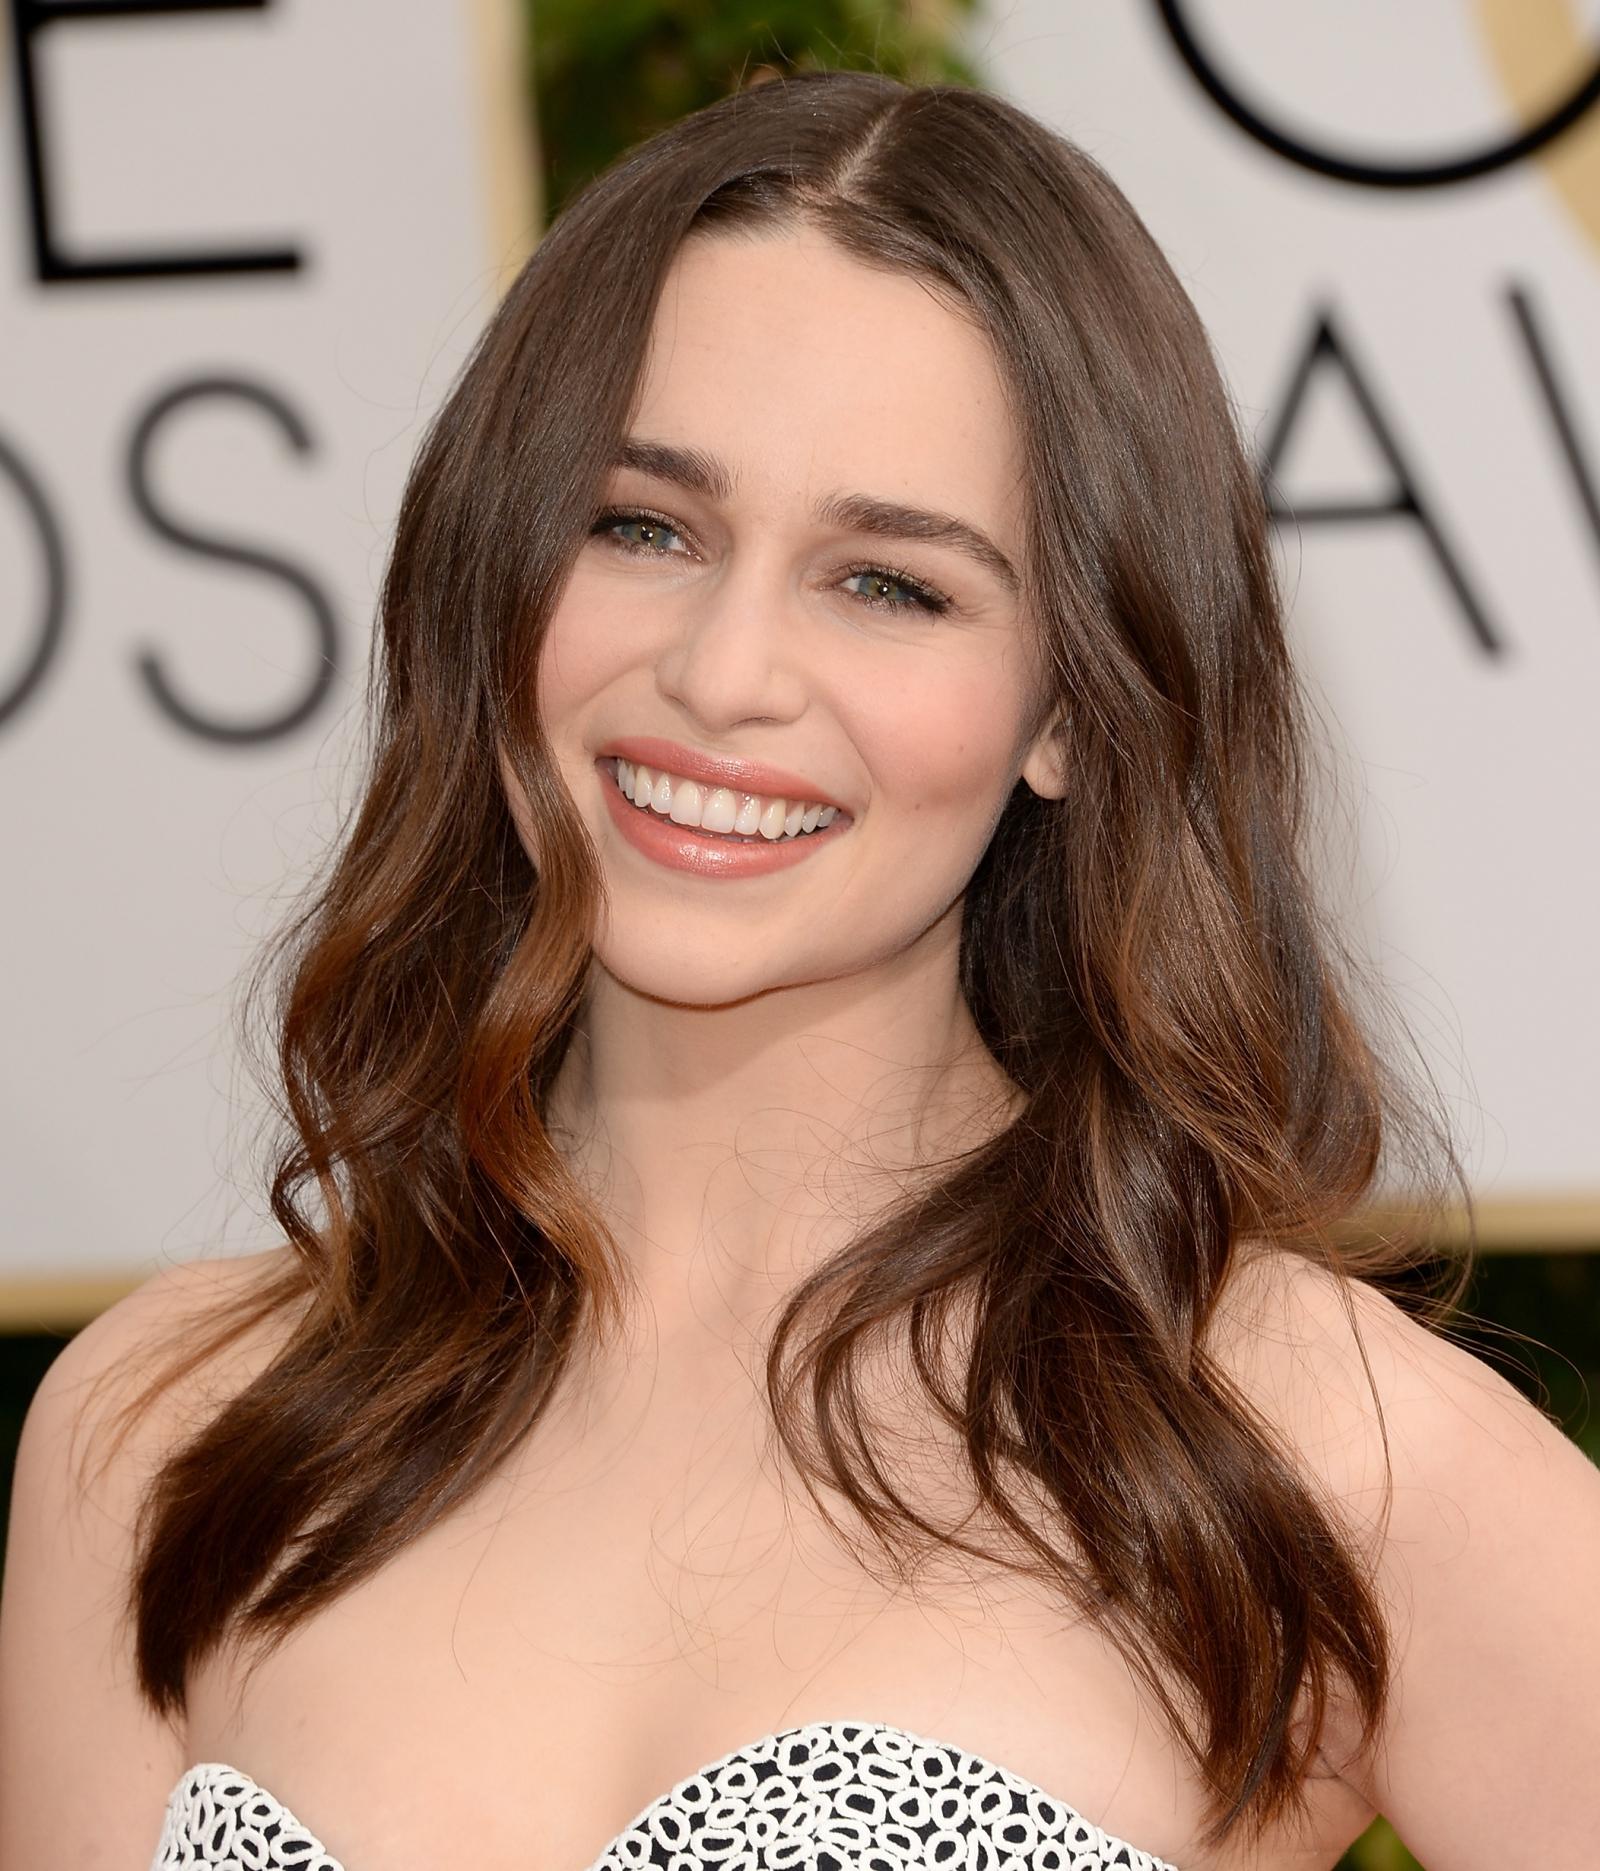 Khaleesi actress dating site